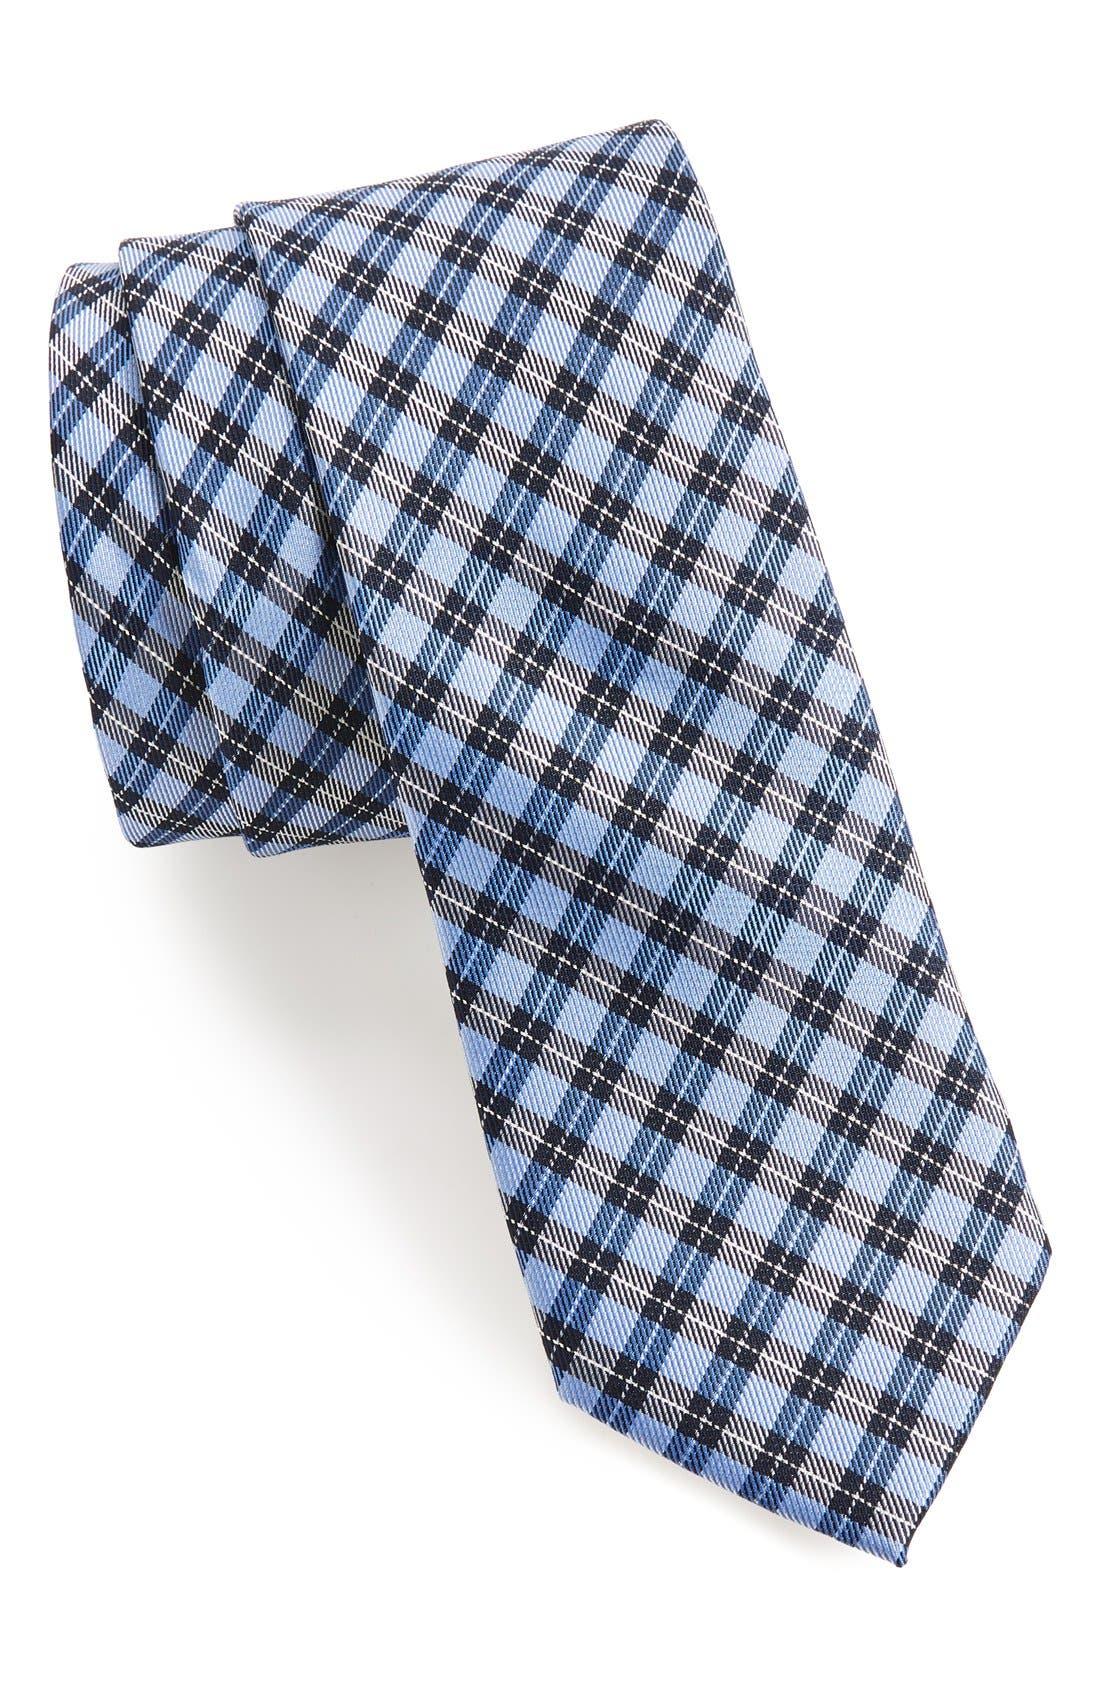 'Choi' Woven Silk Tie,                         Main,                         color, Blue